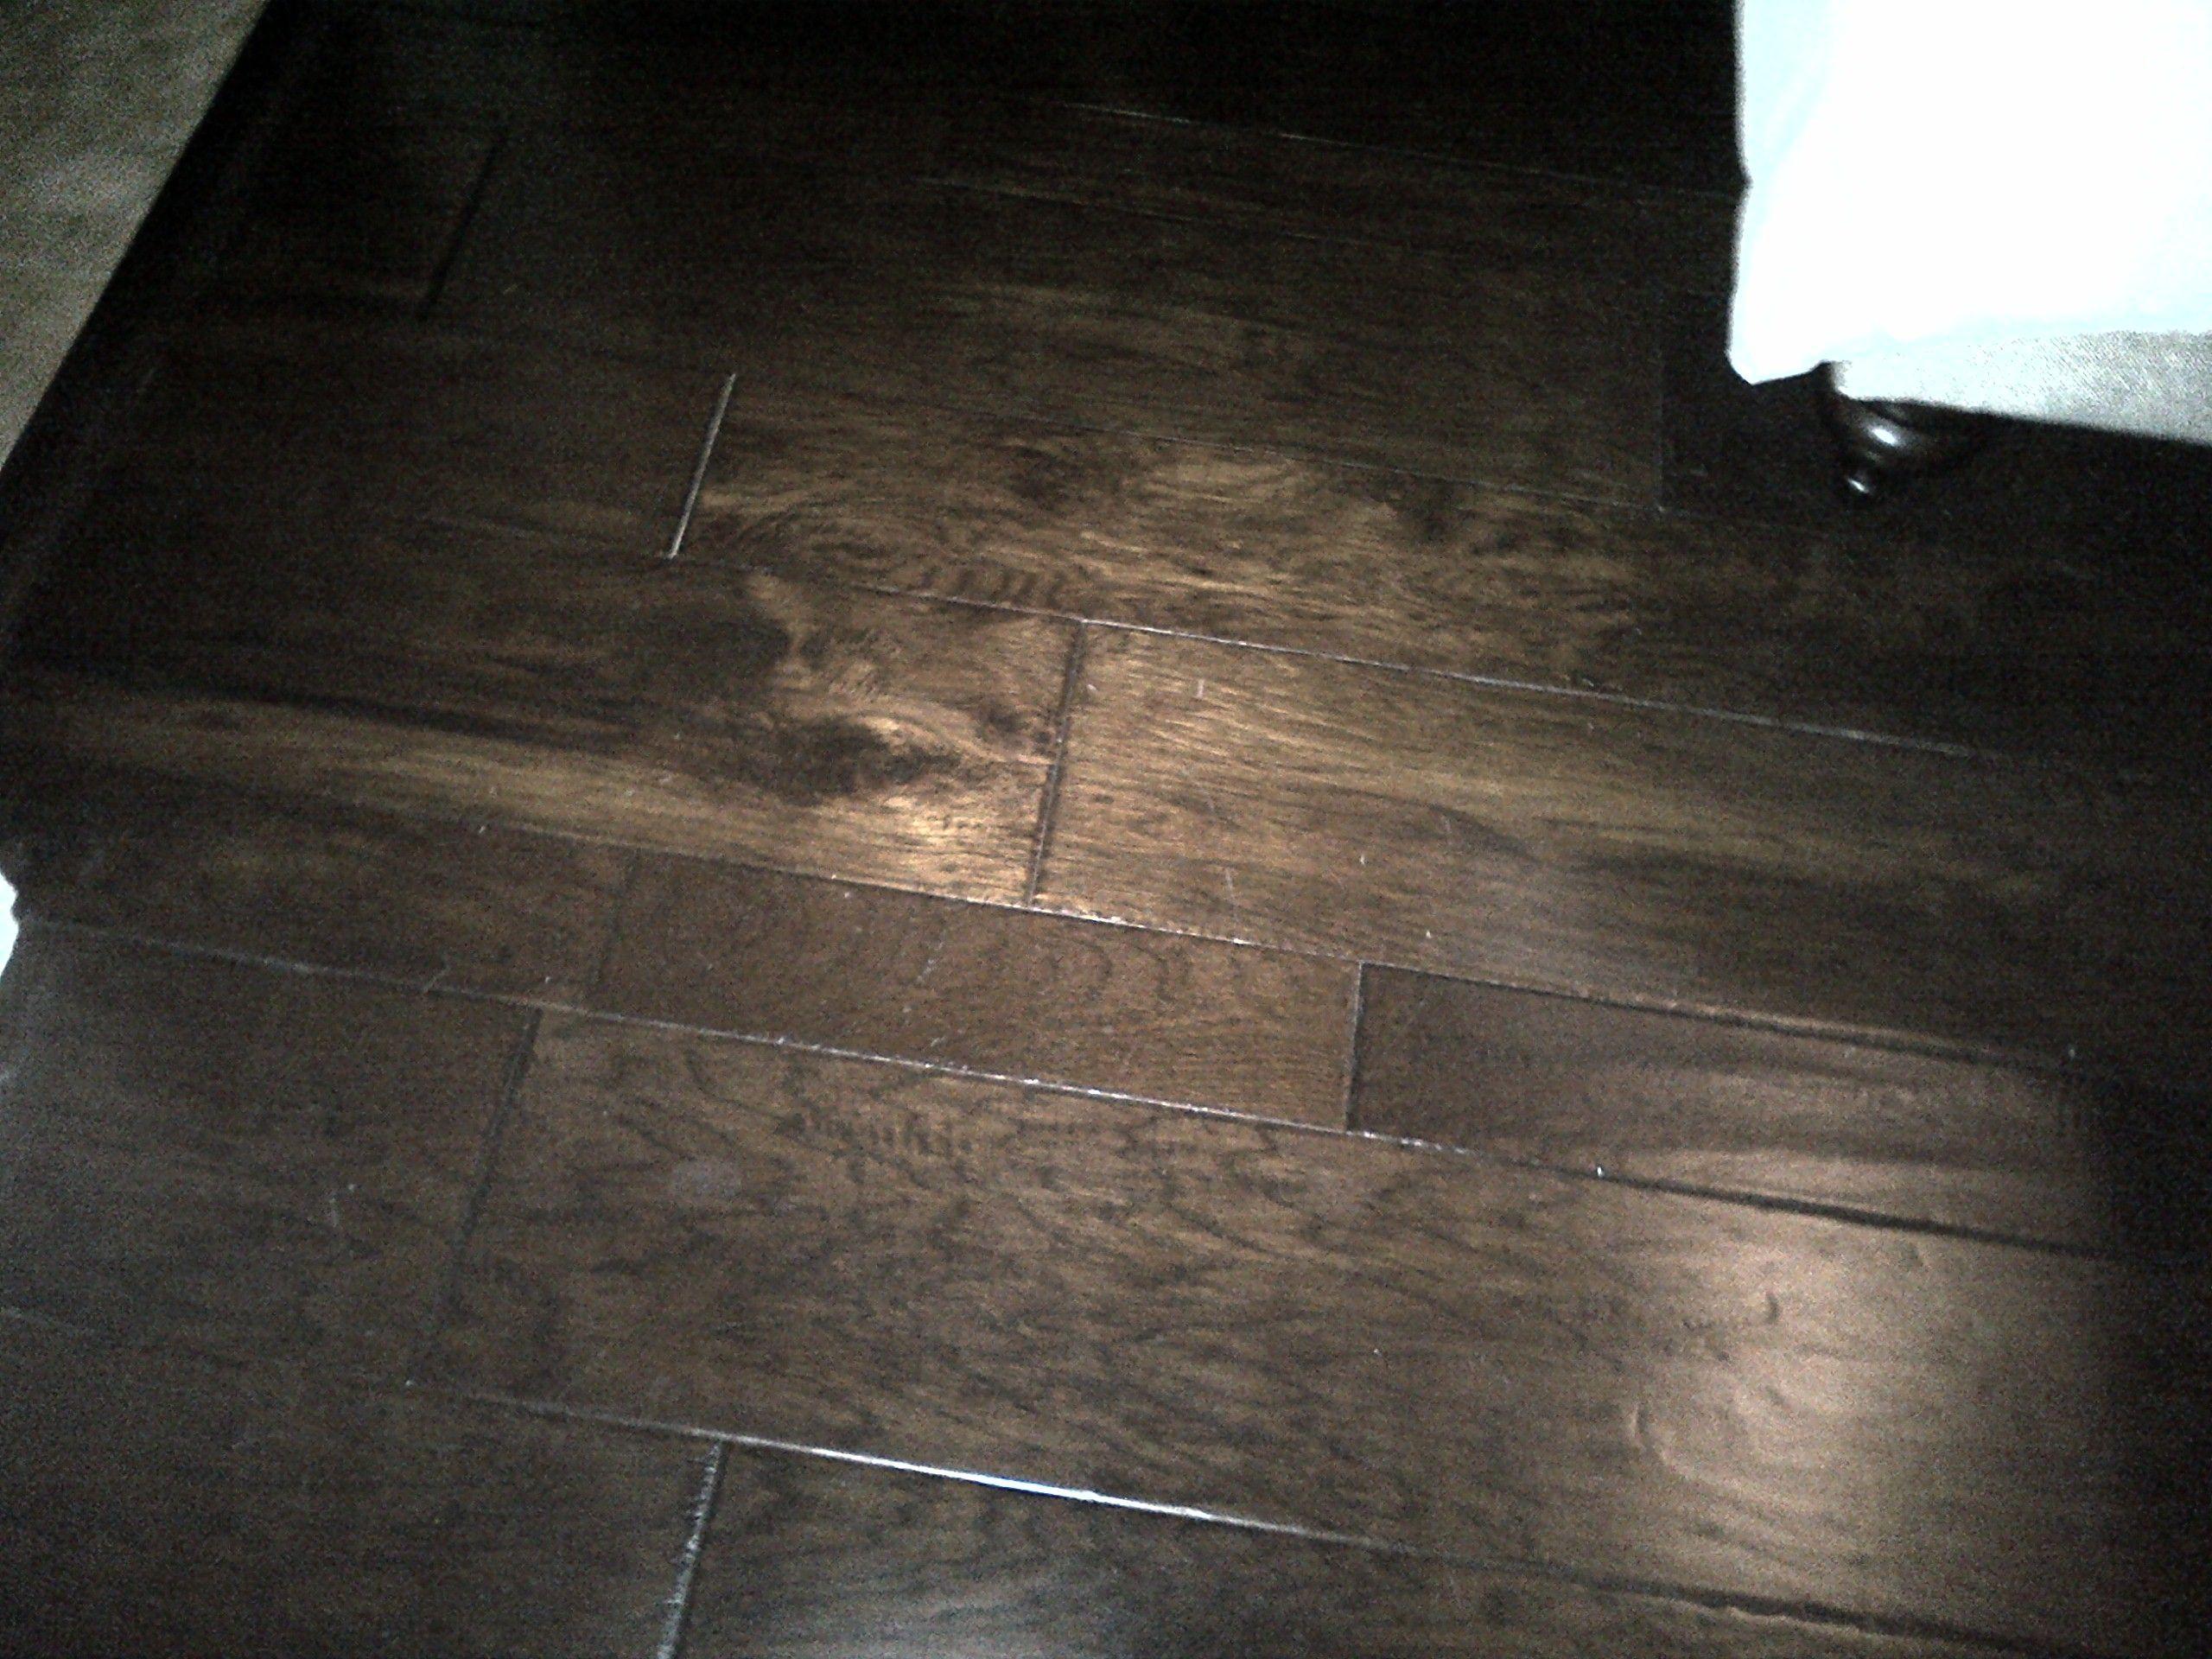 23 Stylish Grades Of Hickory Hardwood Flooring 2021 free download grades of hickory hardwood flooring of bella cera almafi coast maiori variable width plank handscraped regarding bella cera almafi coast maiori variable width plank handscraped hickory 4